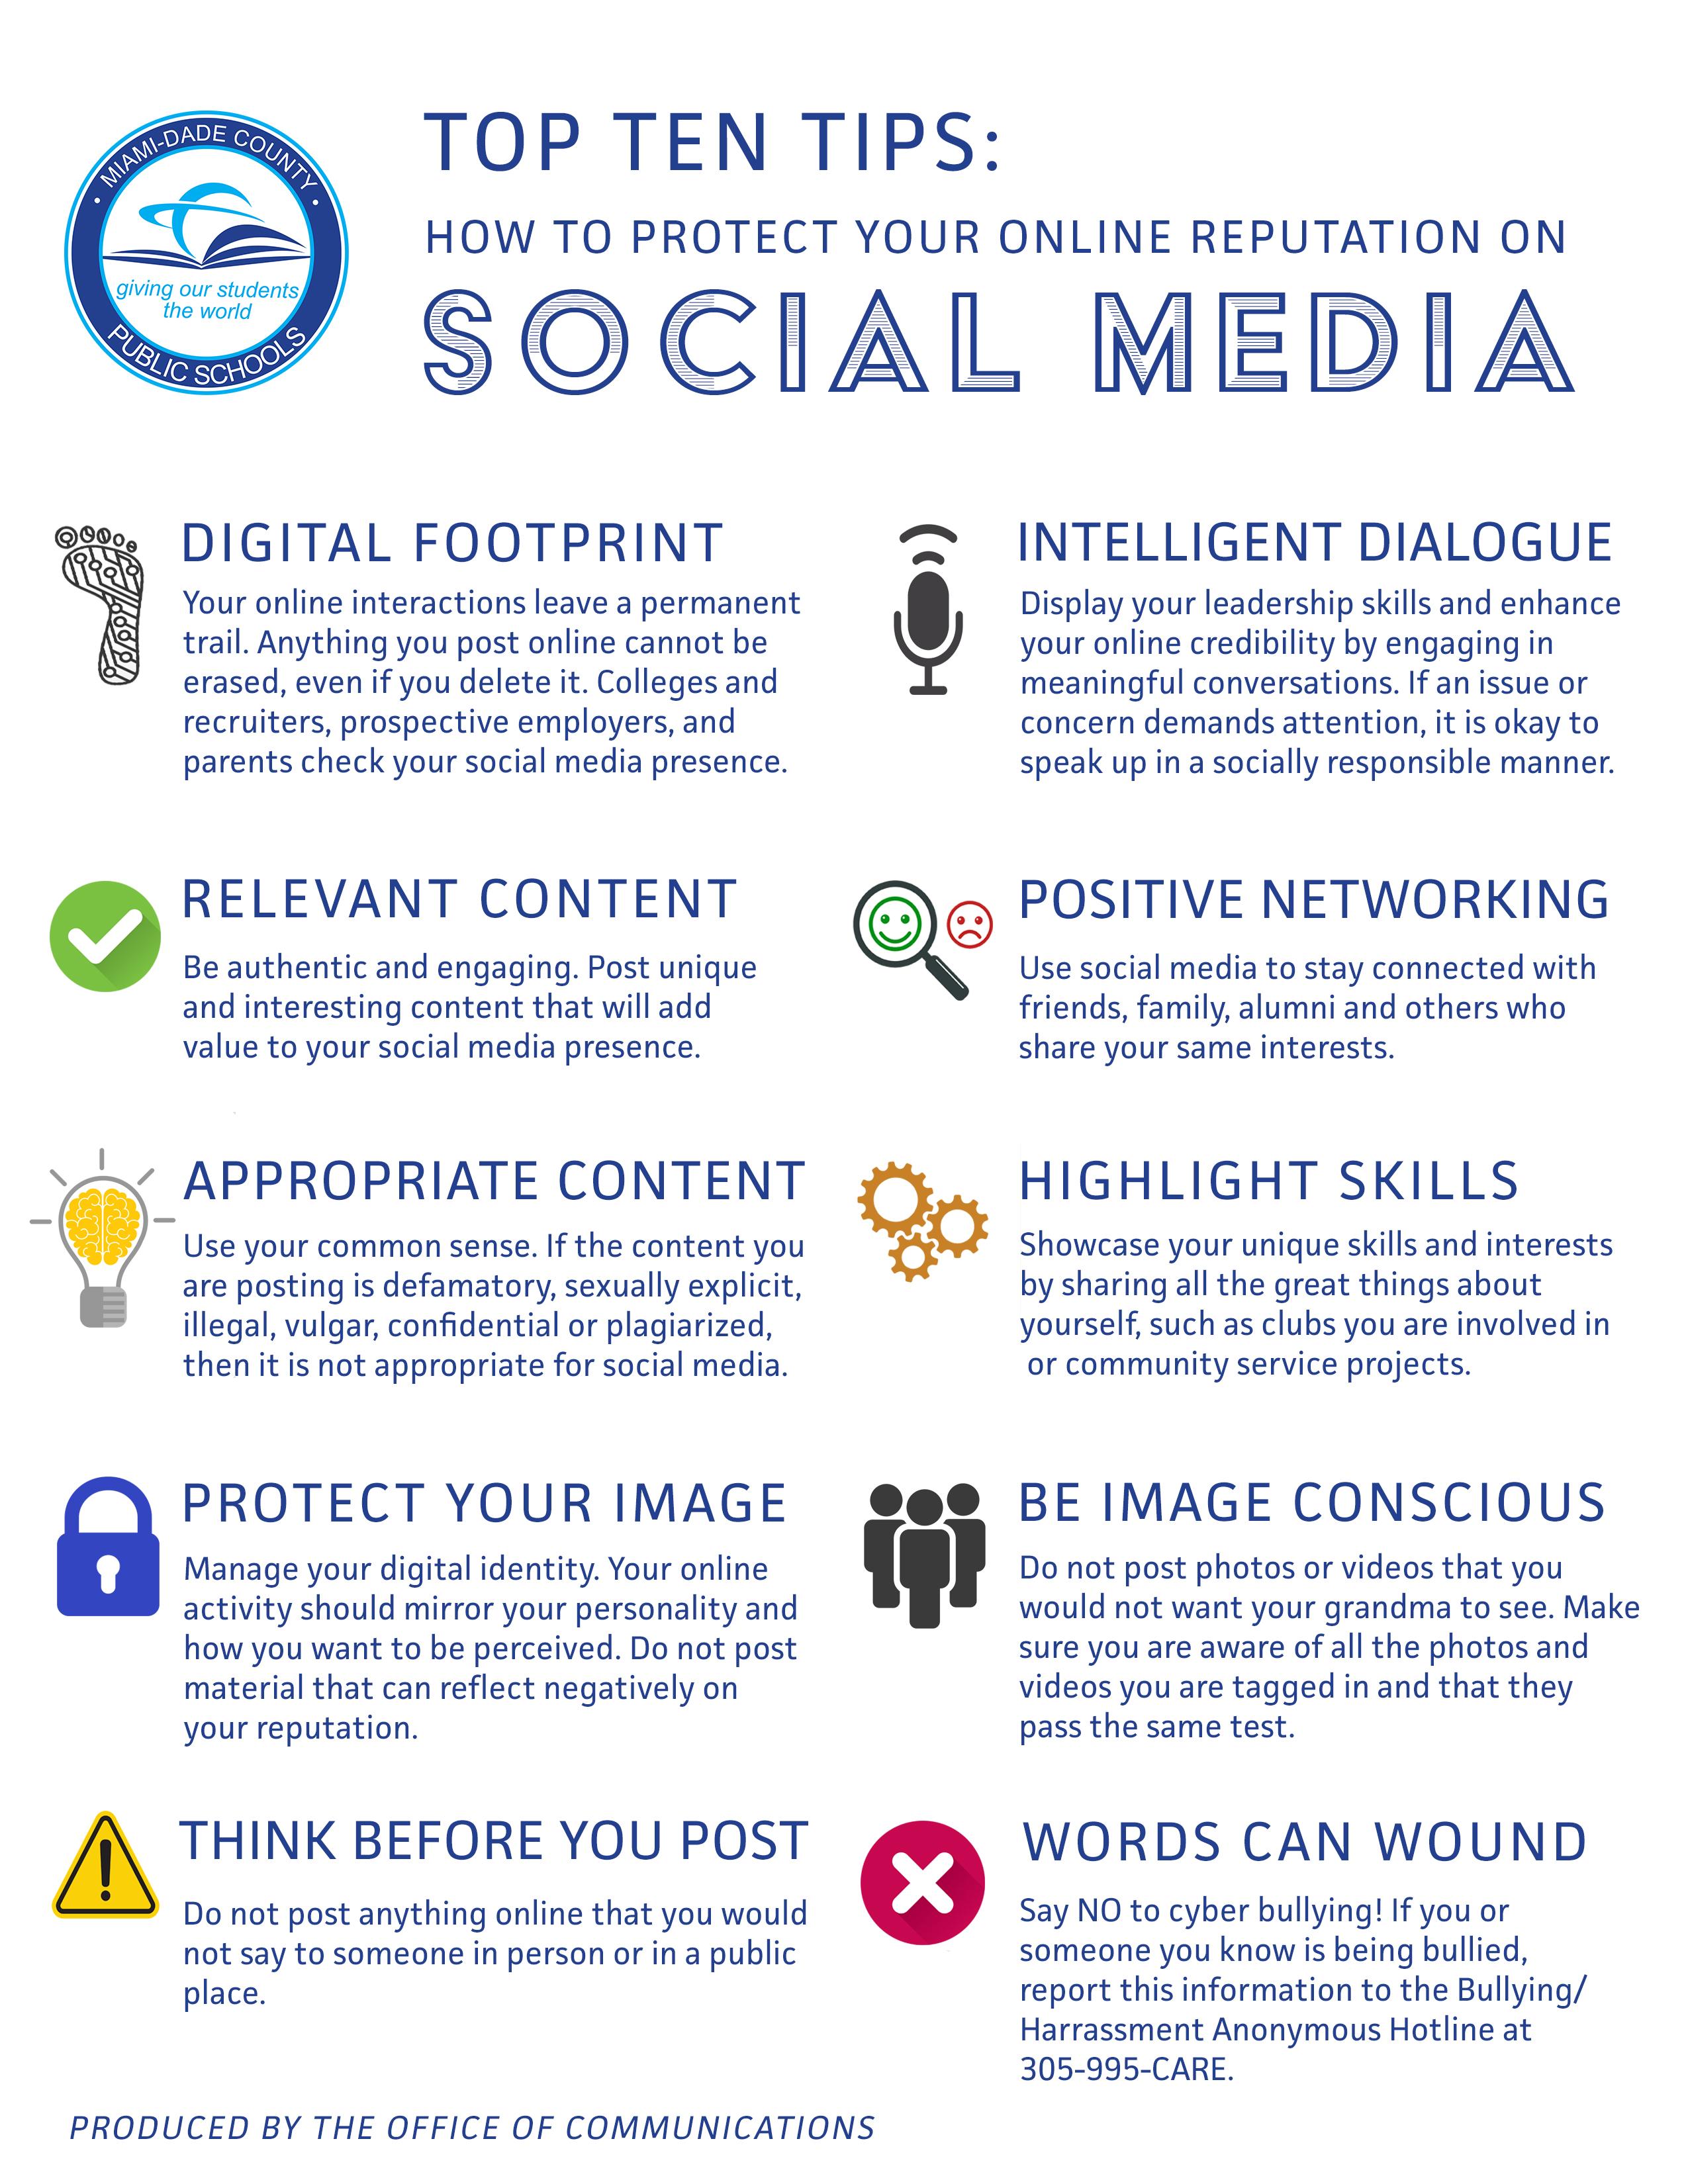 Großzügig Online Lebenslauf Posting Tipps Ideen - Entry Level Resume ...